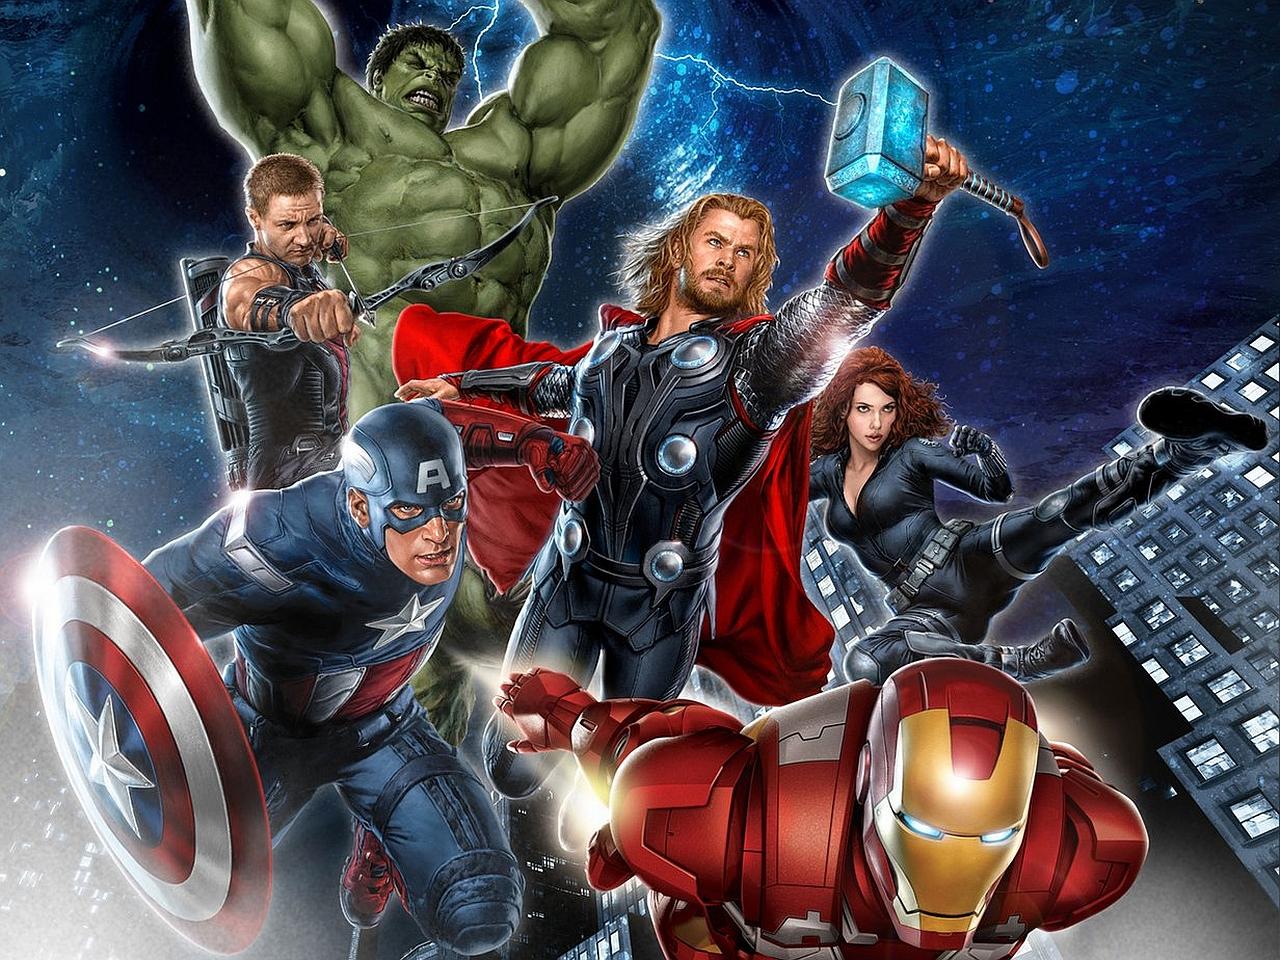 Avengers Computer Wallpapers Desktop Backgrounds 1280x960 ID 1280x960